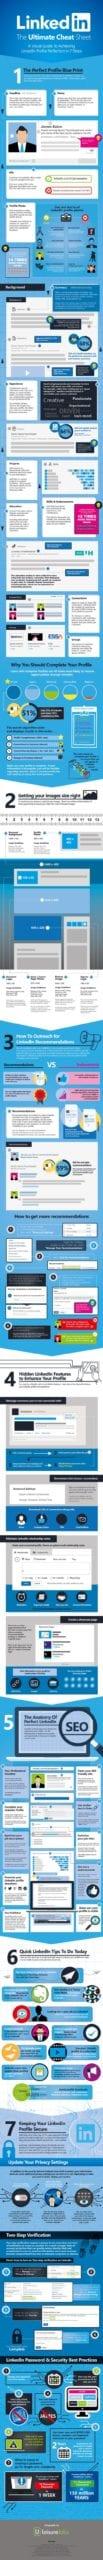 Healthcare IT LinkedIn Cheat Sheet